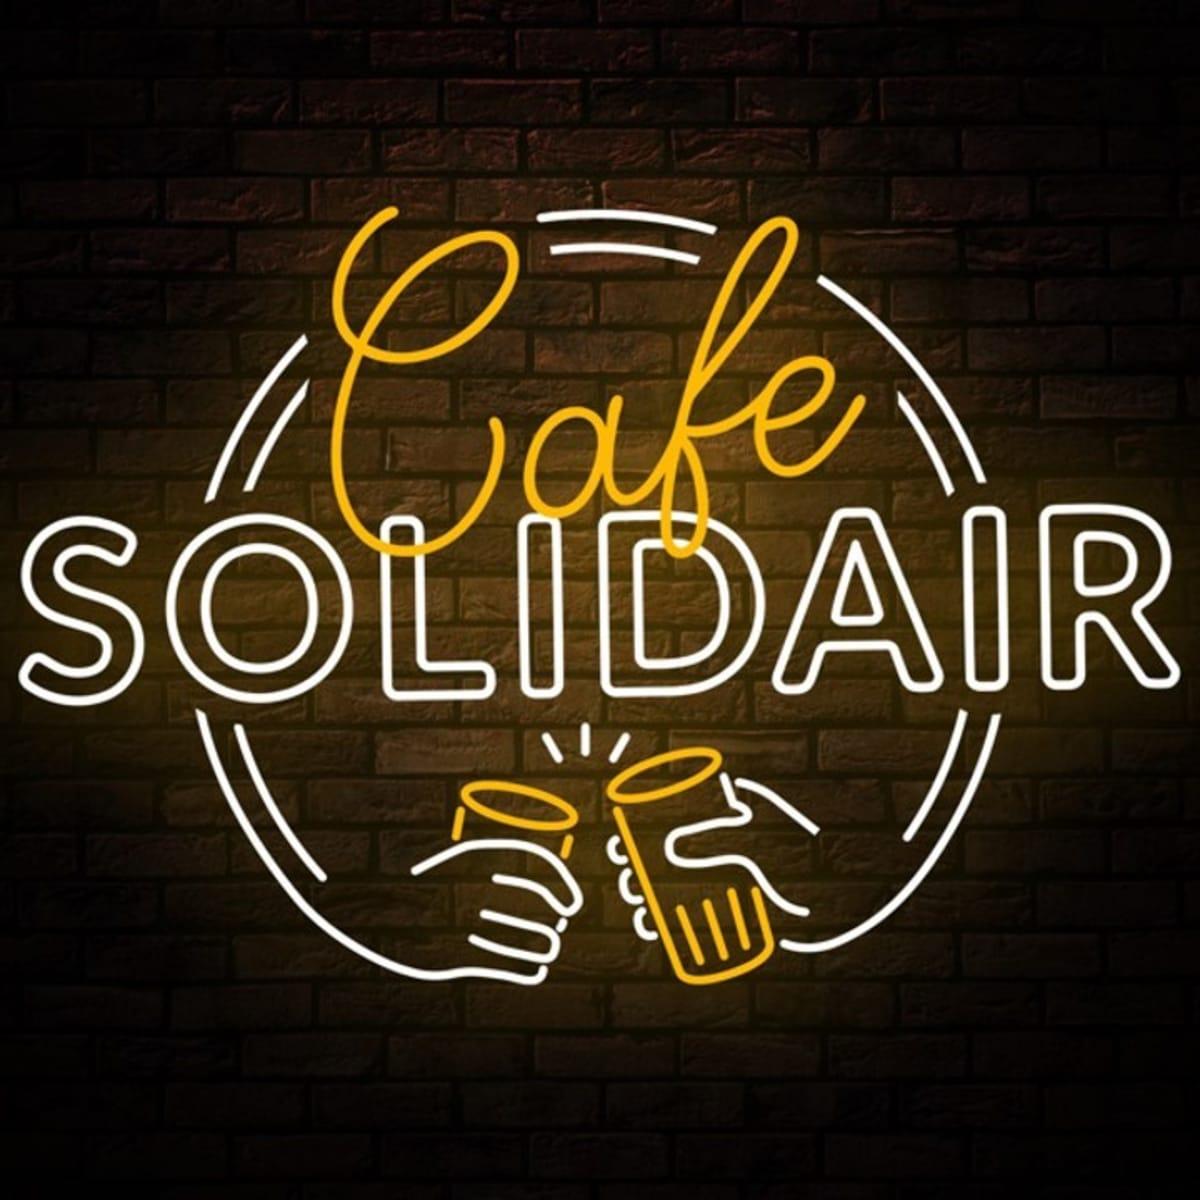 Cafe Solodair